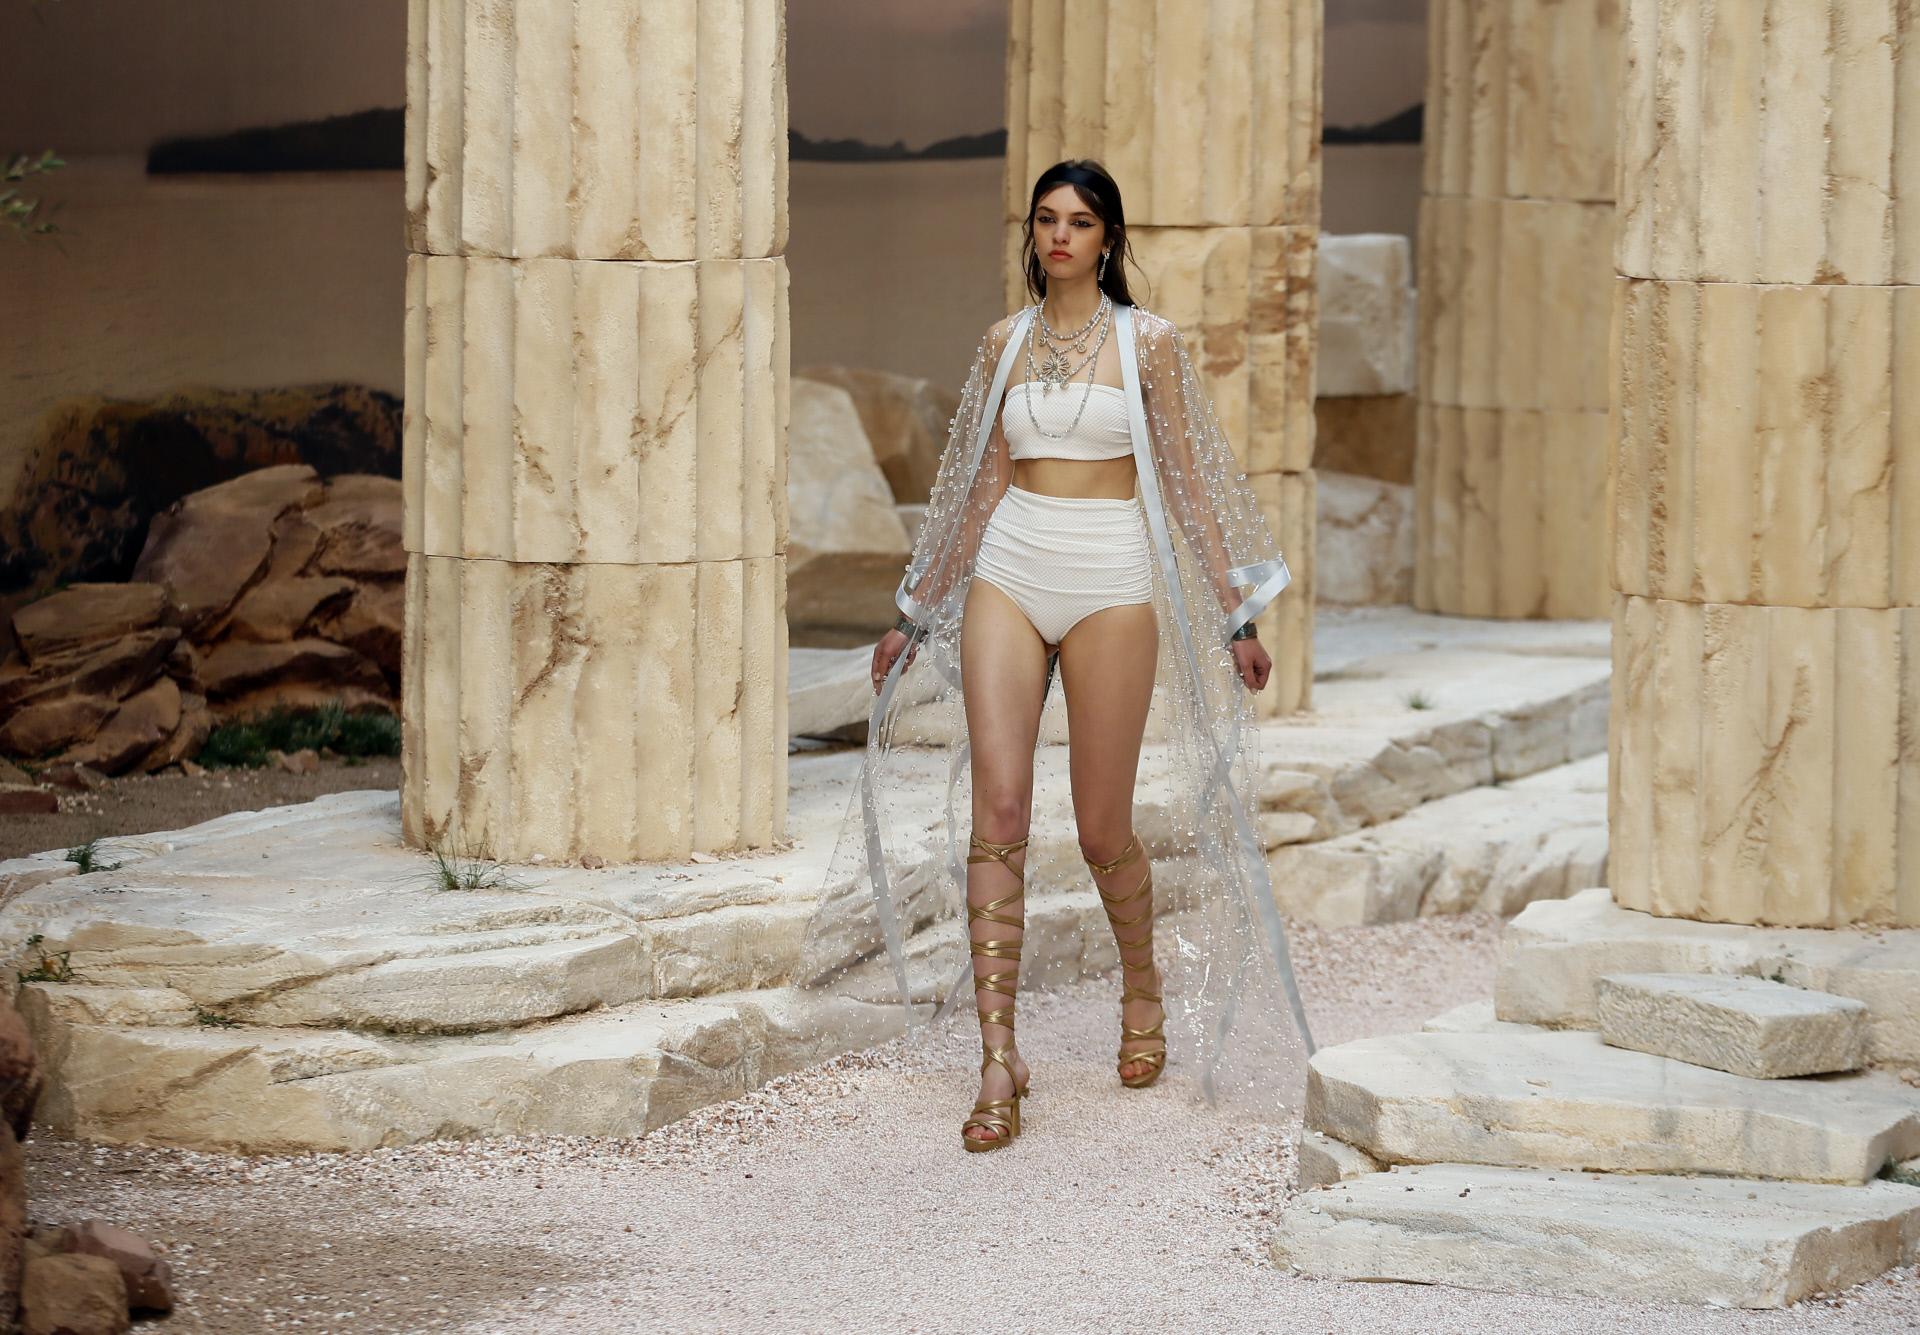 Chanel Colección Crucero 2018 París